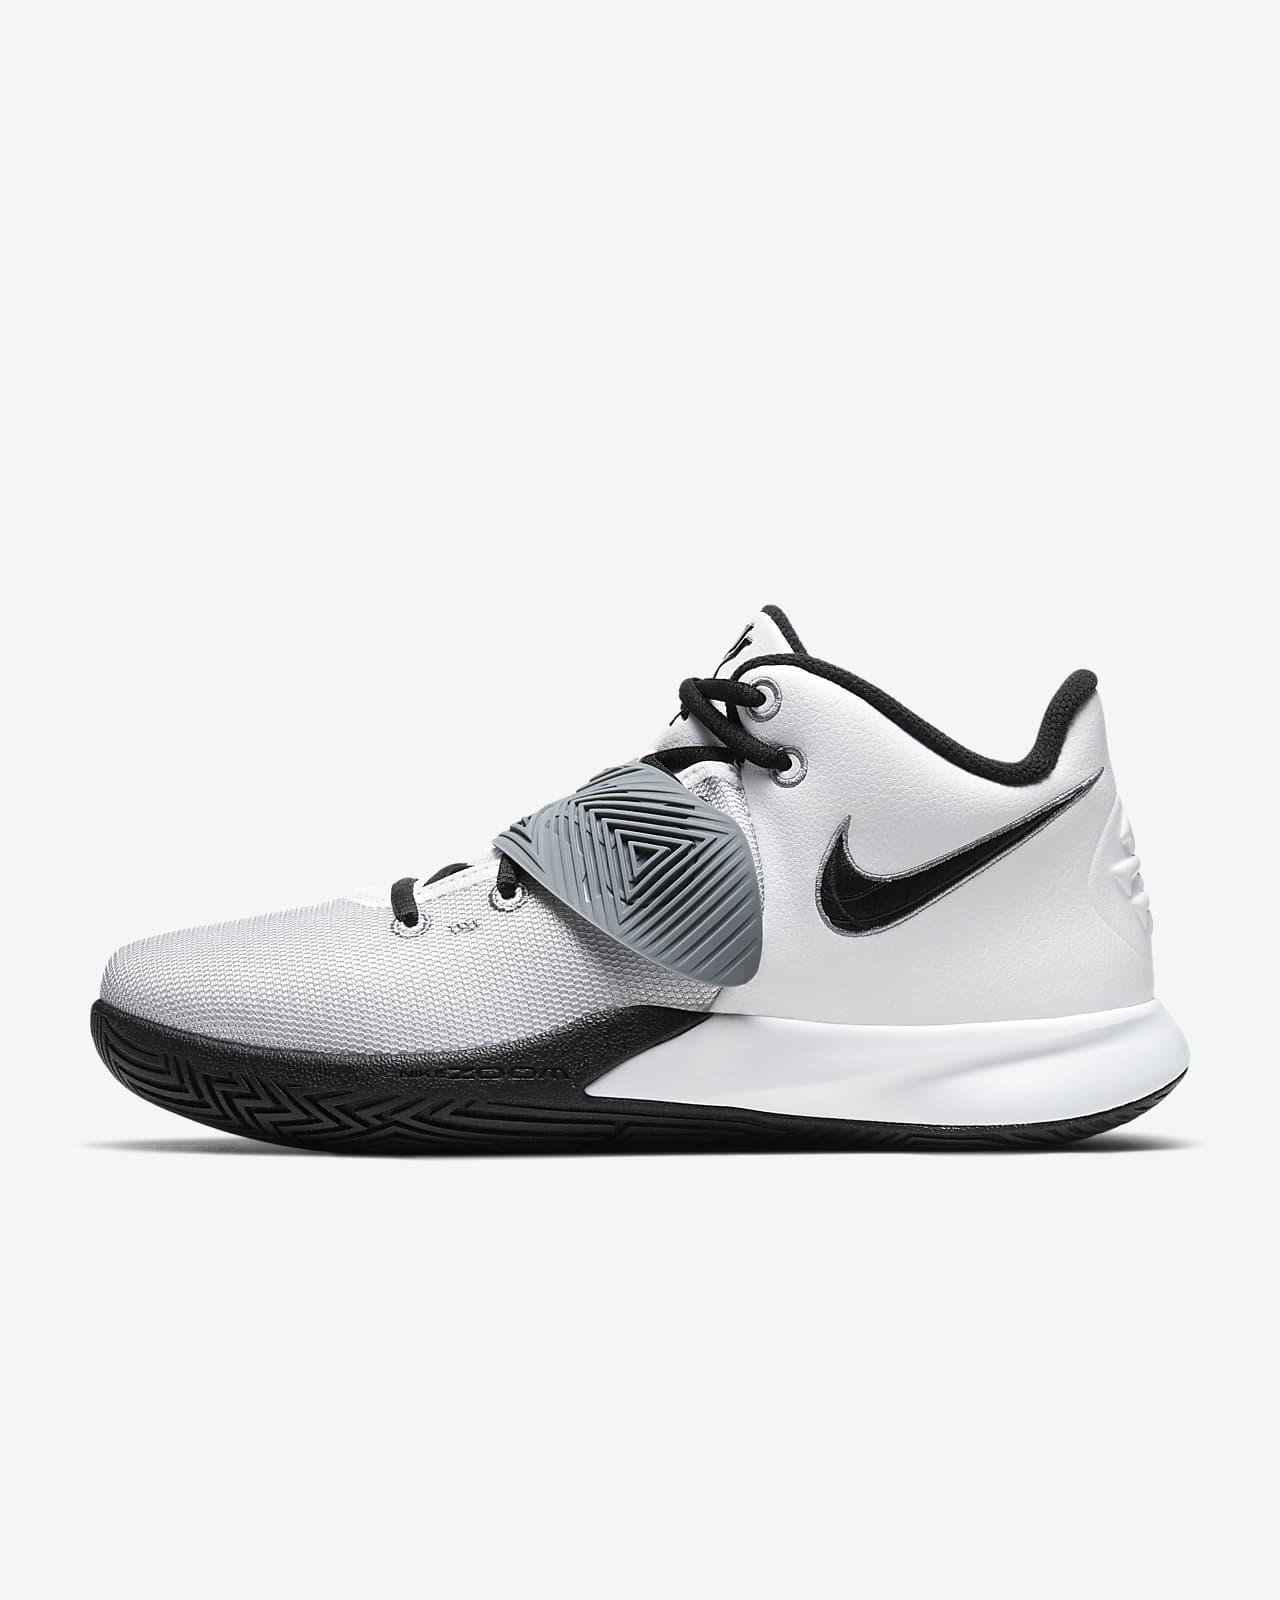 Kyrie Flytrap 3 EP 籃球鞋